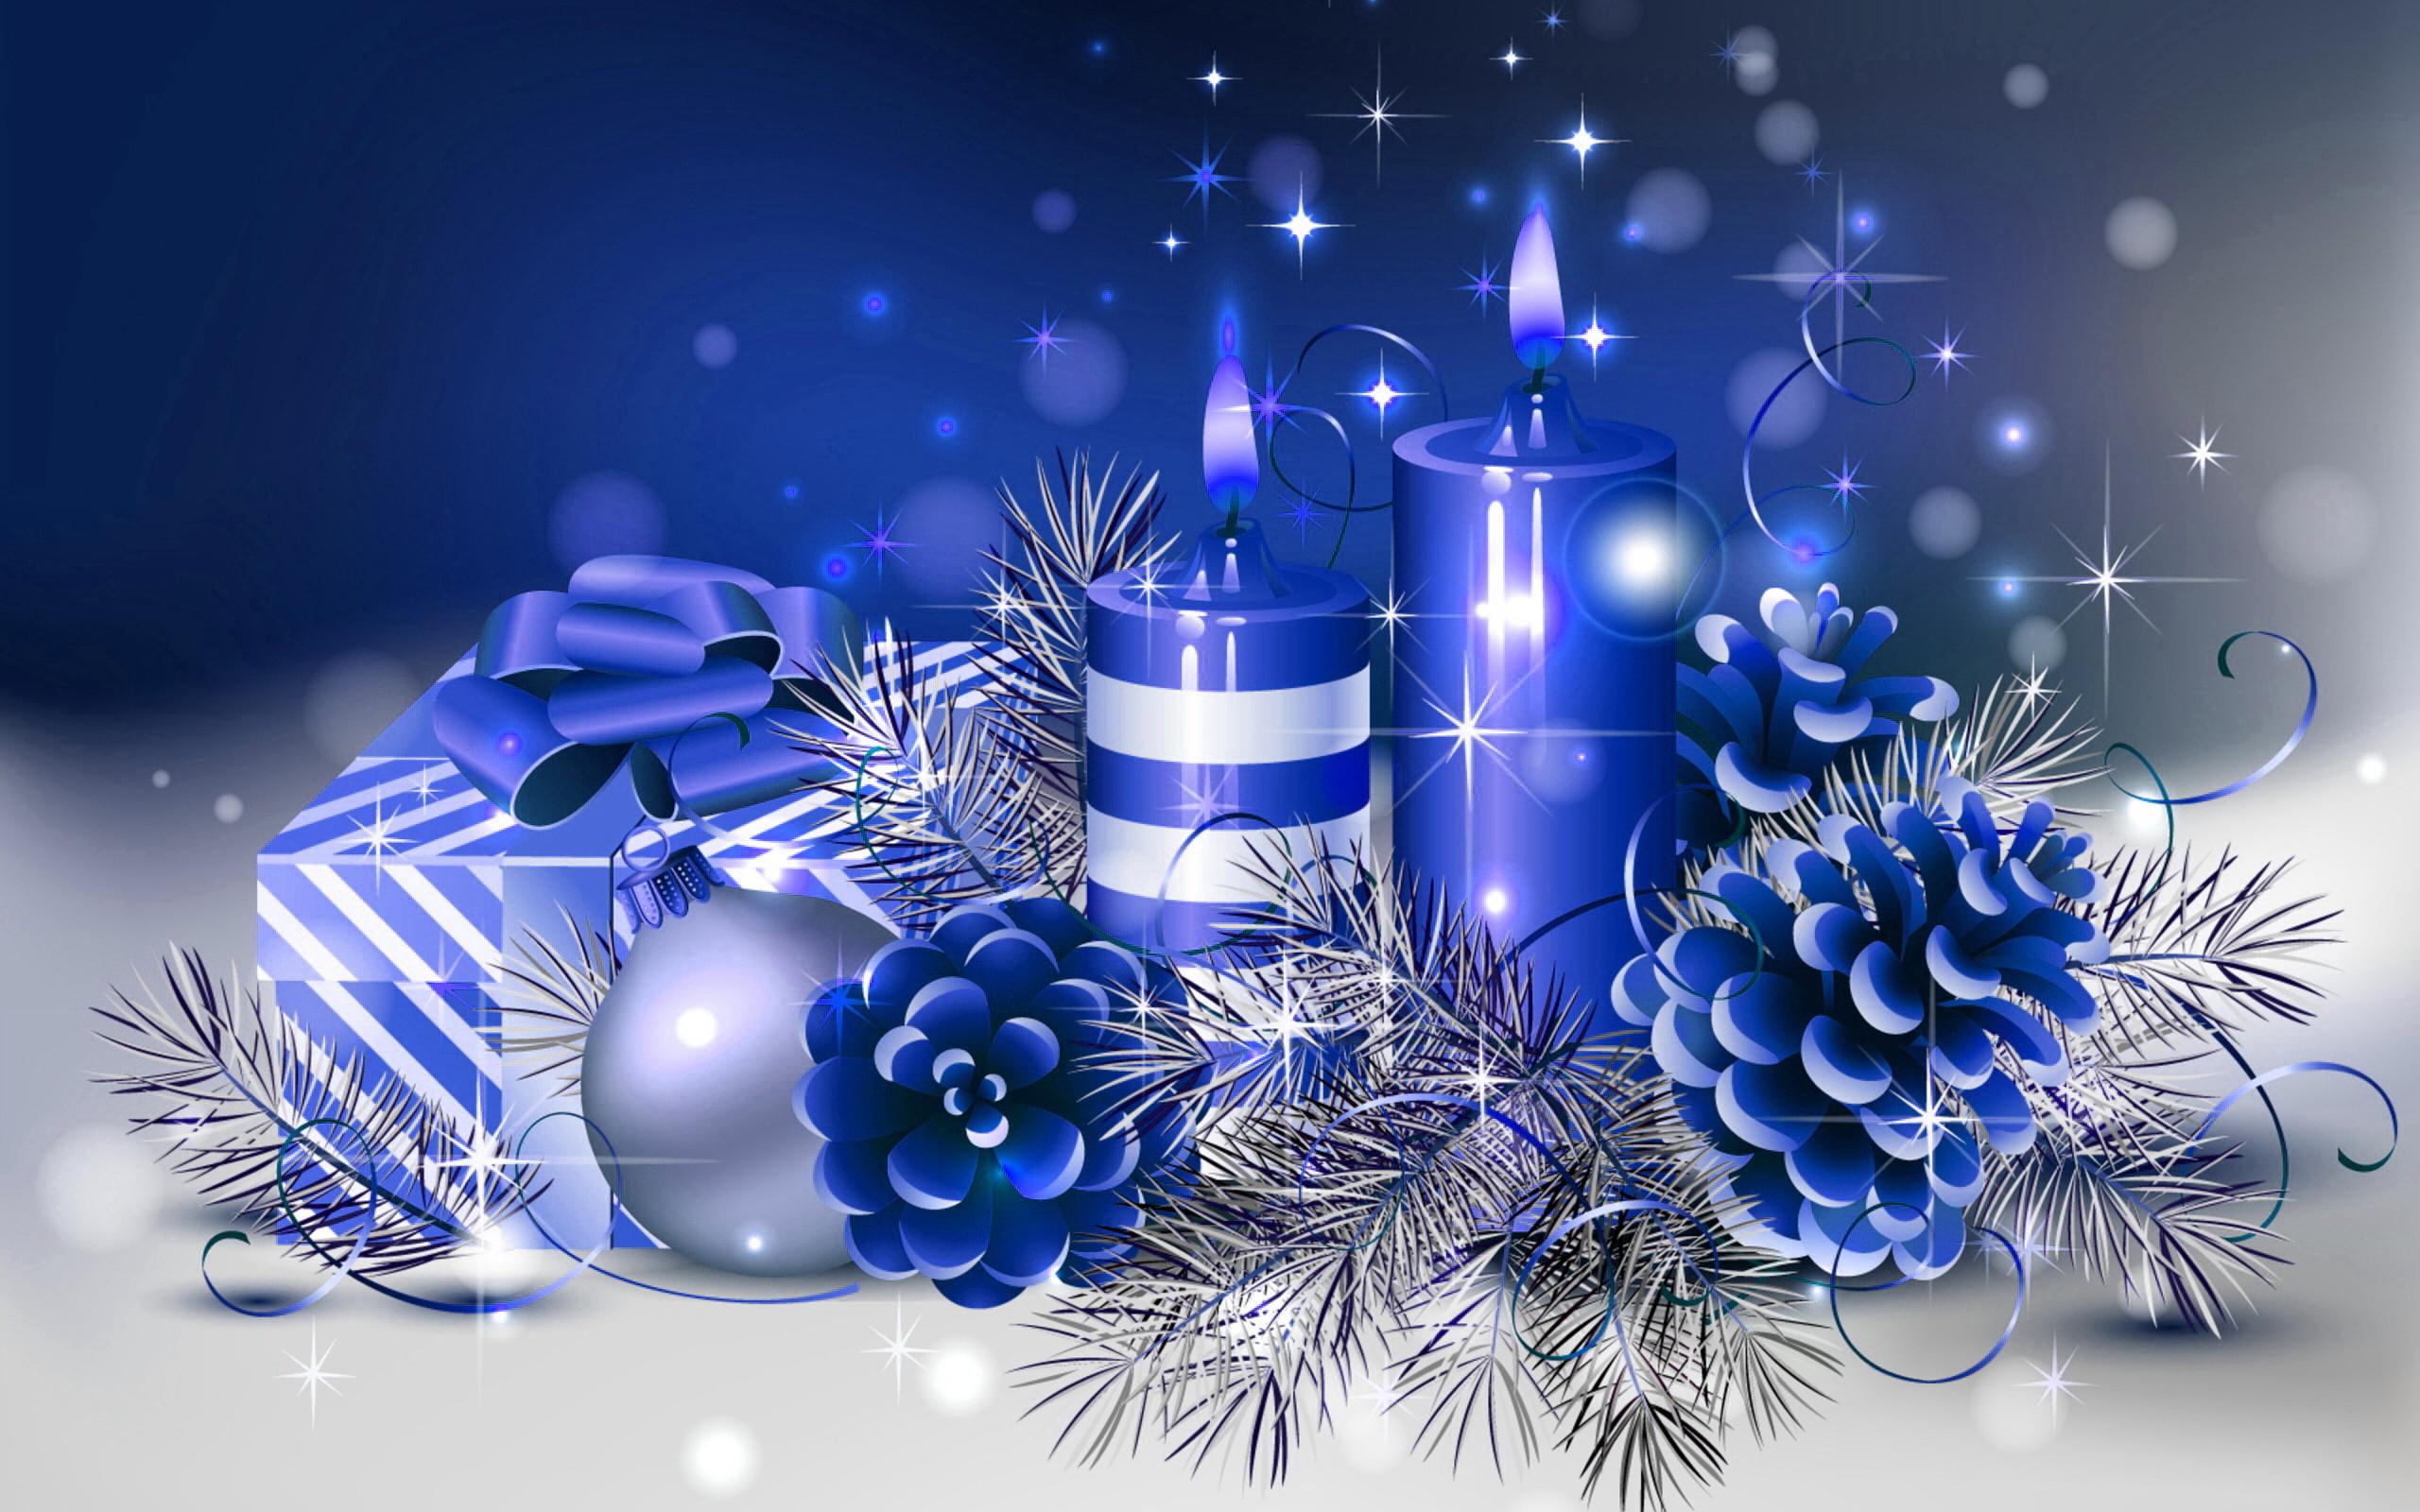 HD Blue Christmas Wallpaper.